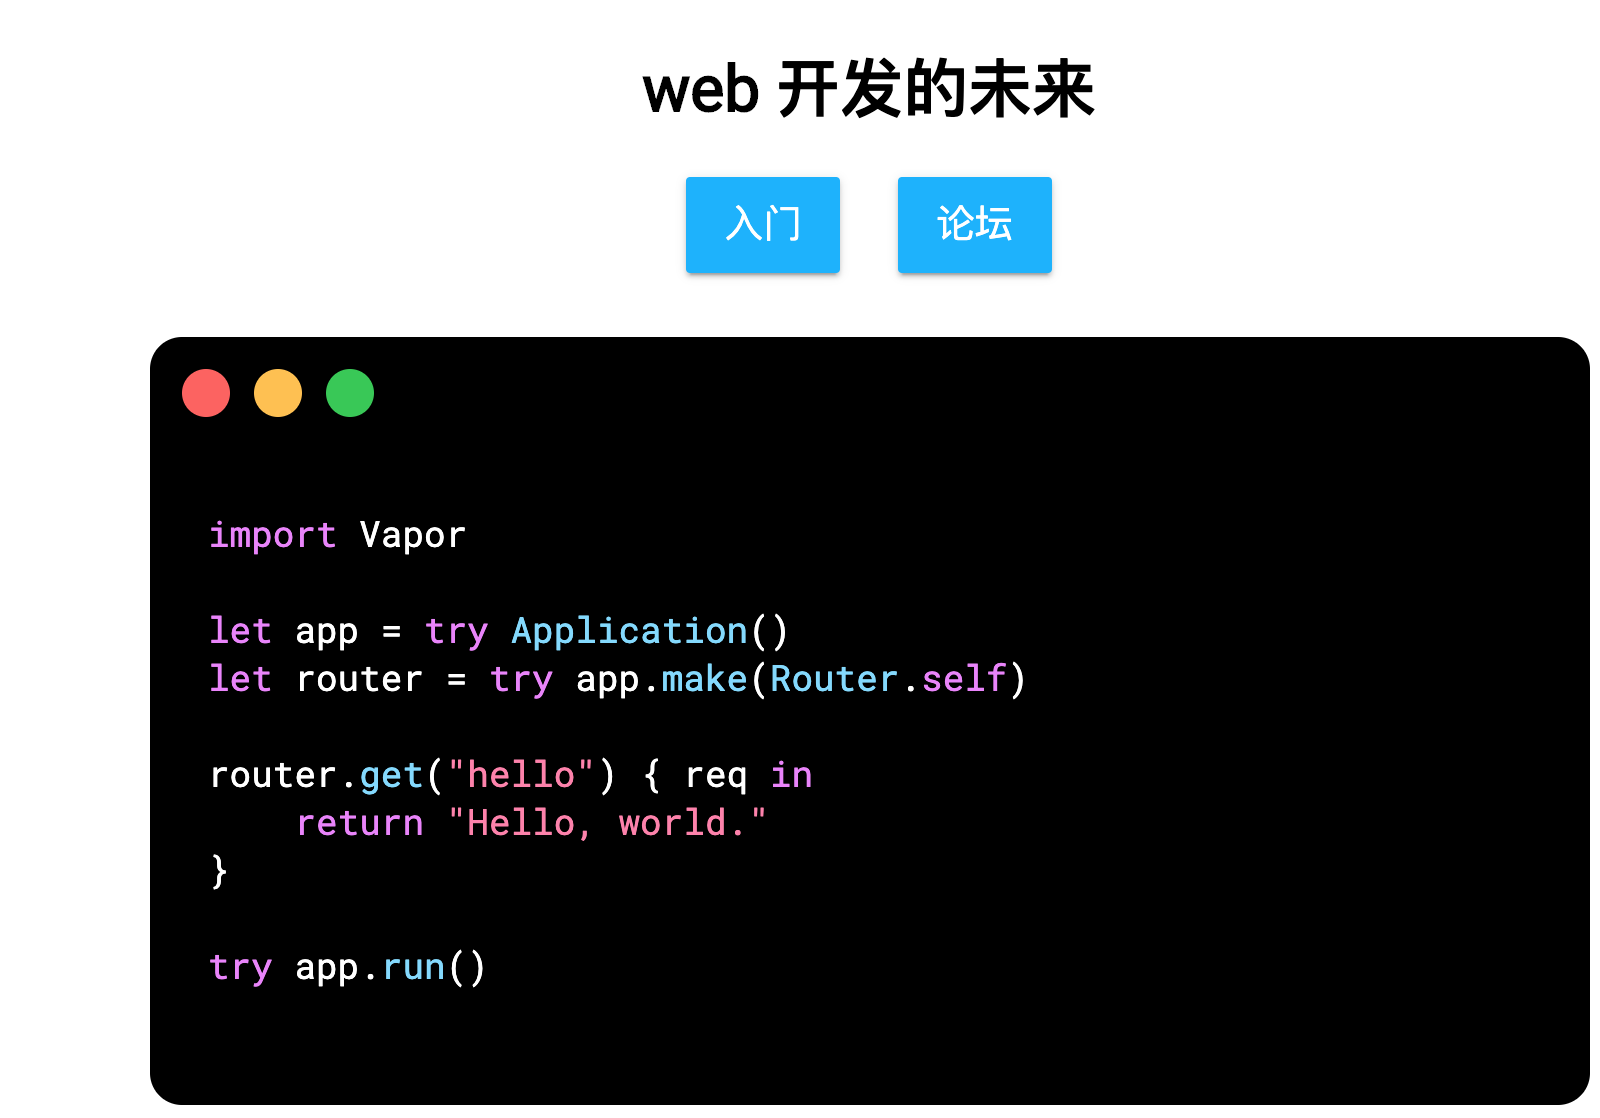 Swift語言快速开发Web后台运行,GitHub排名前10新项目强烈推荐提议个人收藏